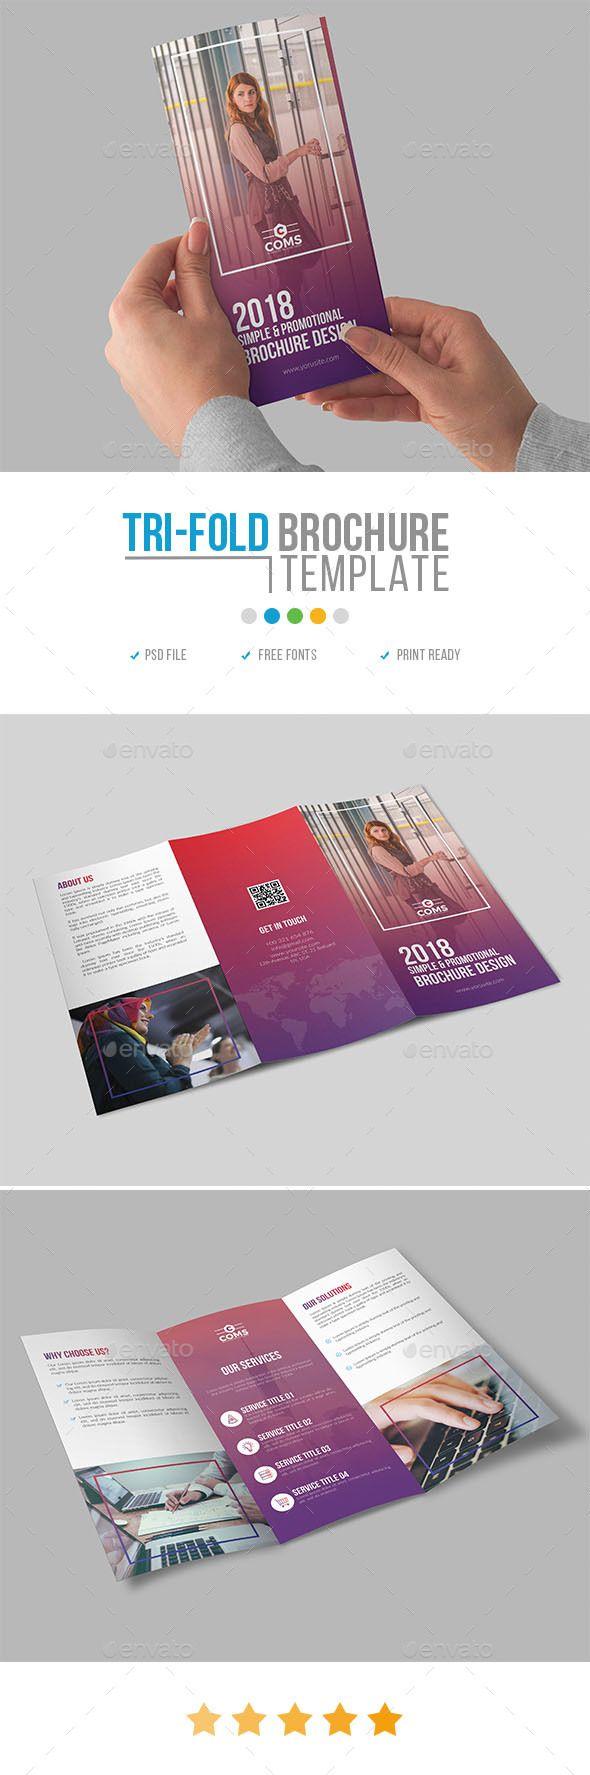 #Corporate #Trifold #Brochure #Template 26   Corporate Brochures